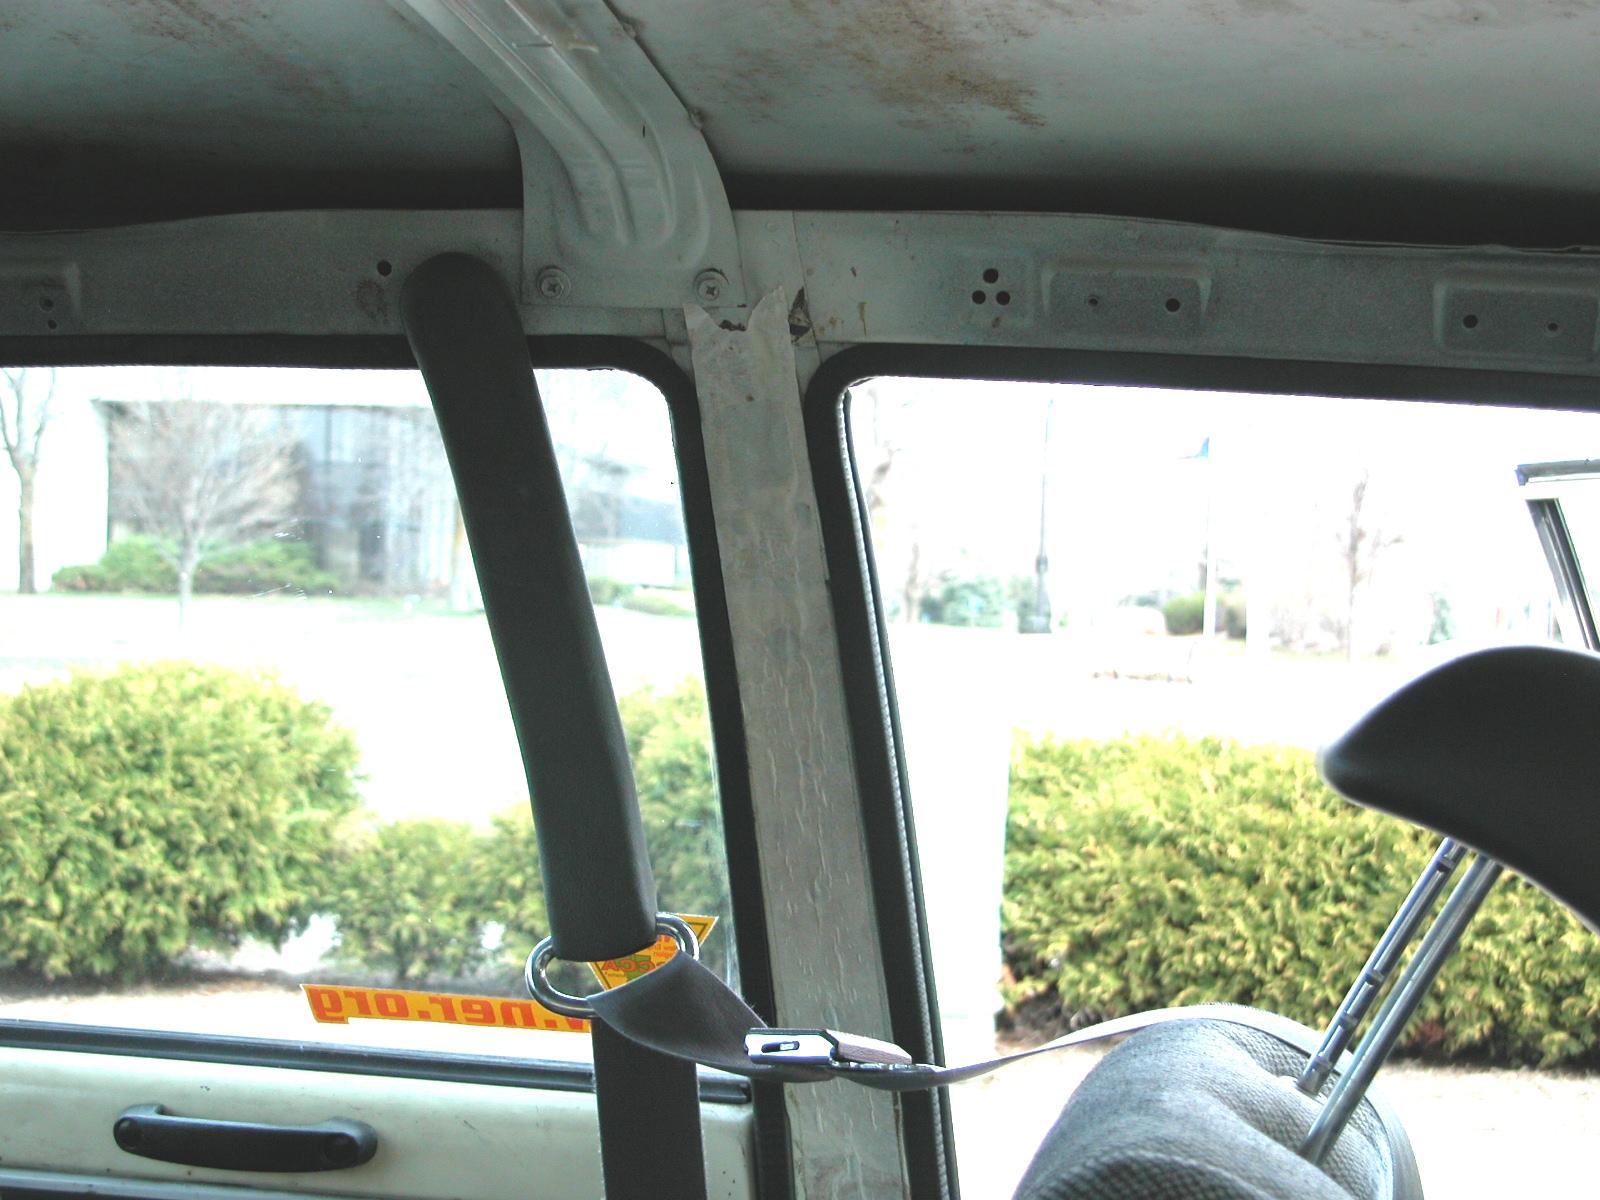 Retracting Seatbelt Install Dropdown